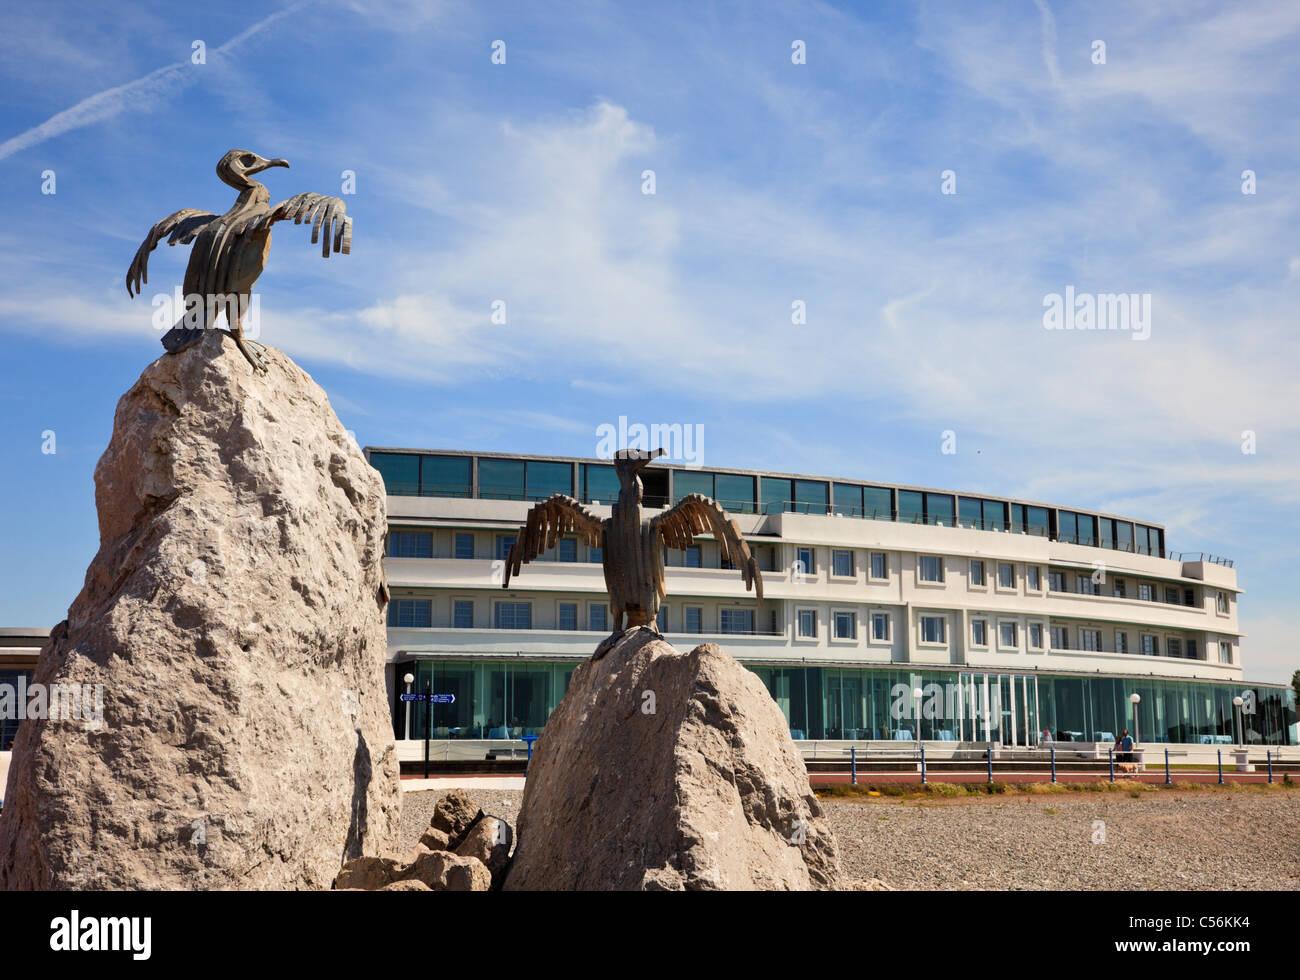 Cormorant steel sculptures and Art deco luxury Midland Hotel on the seafront. Morecambe, Lancashire, England, UK. - Stock Image